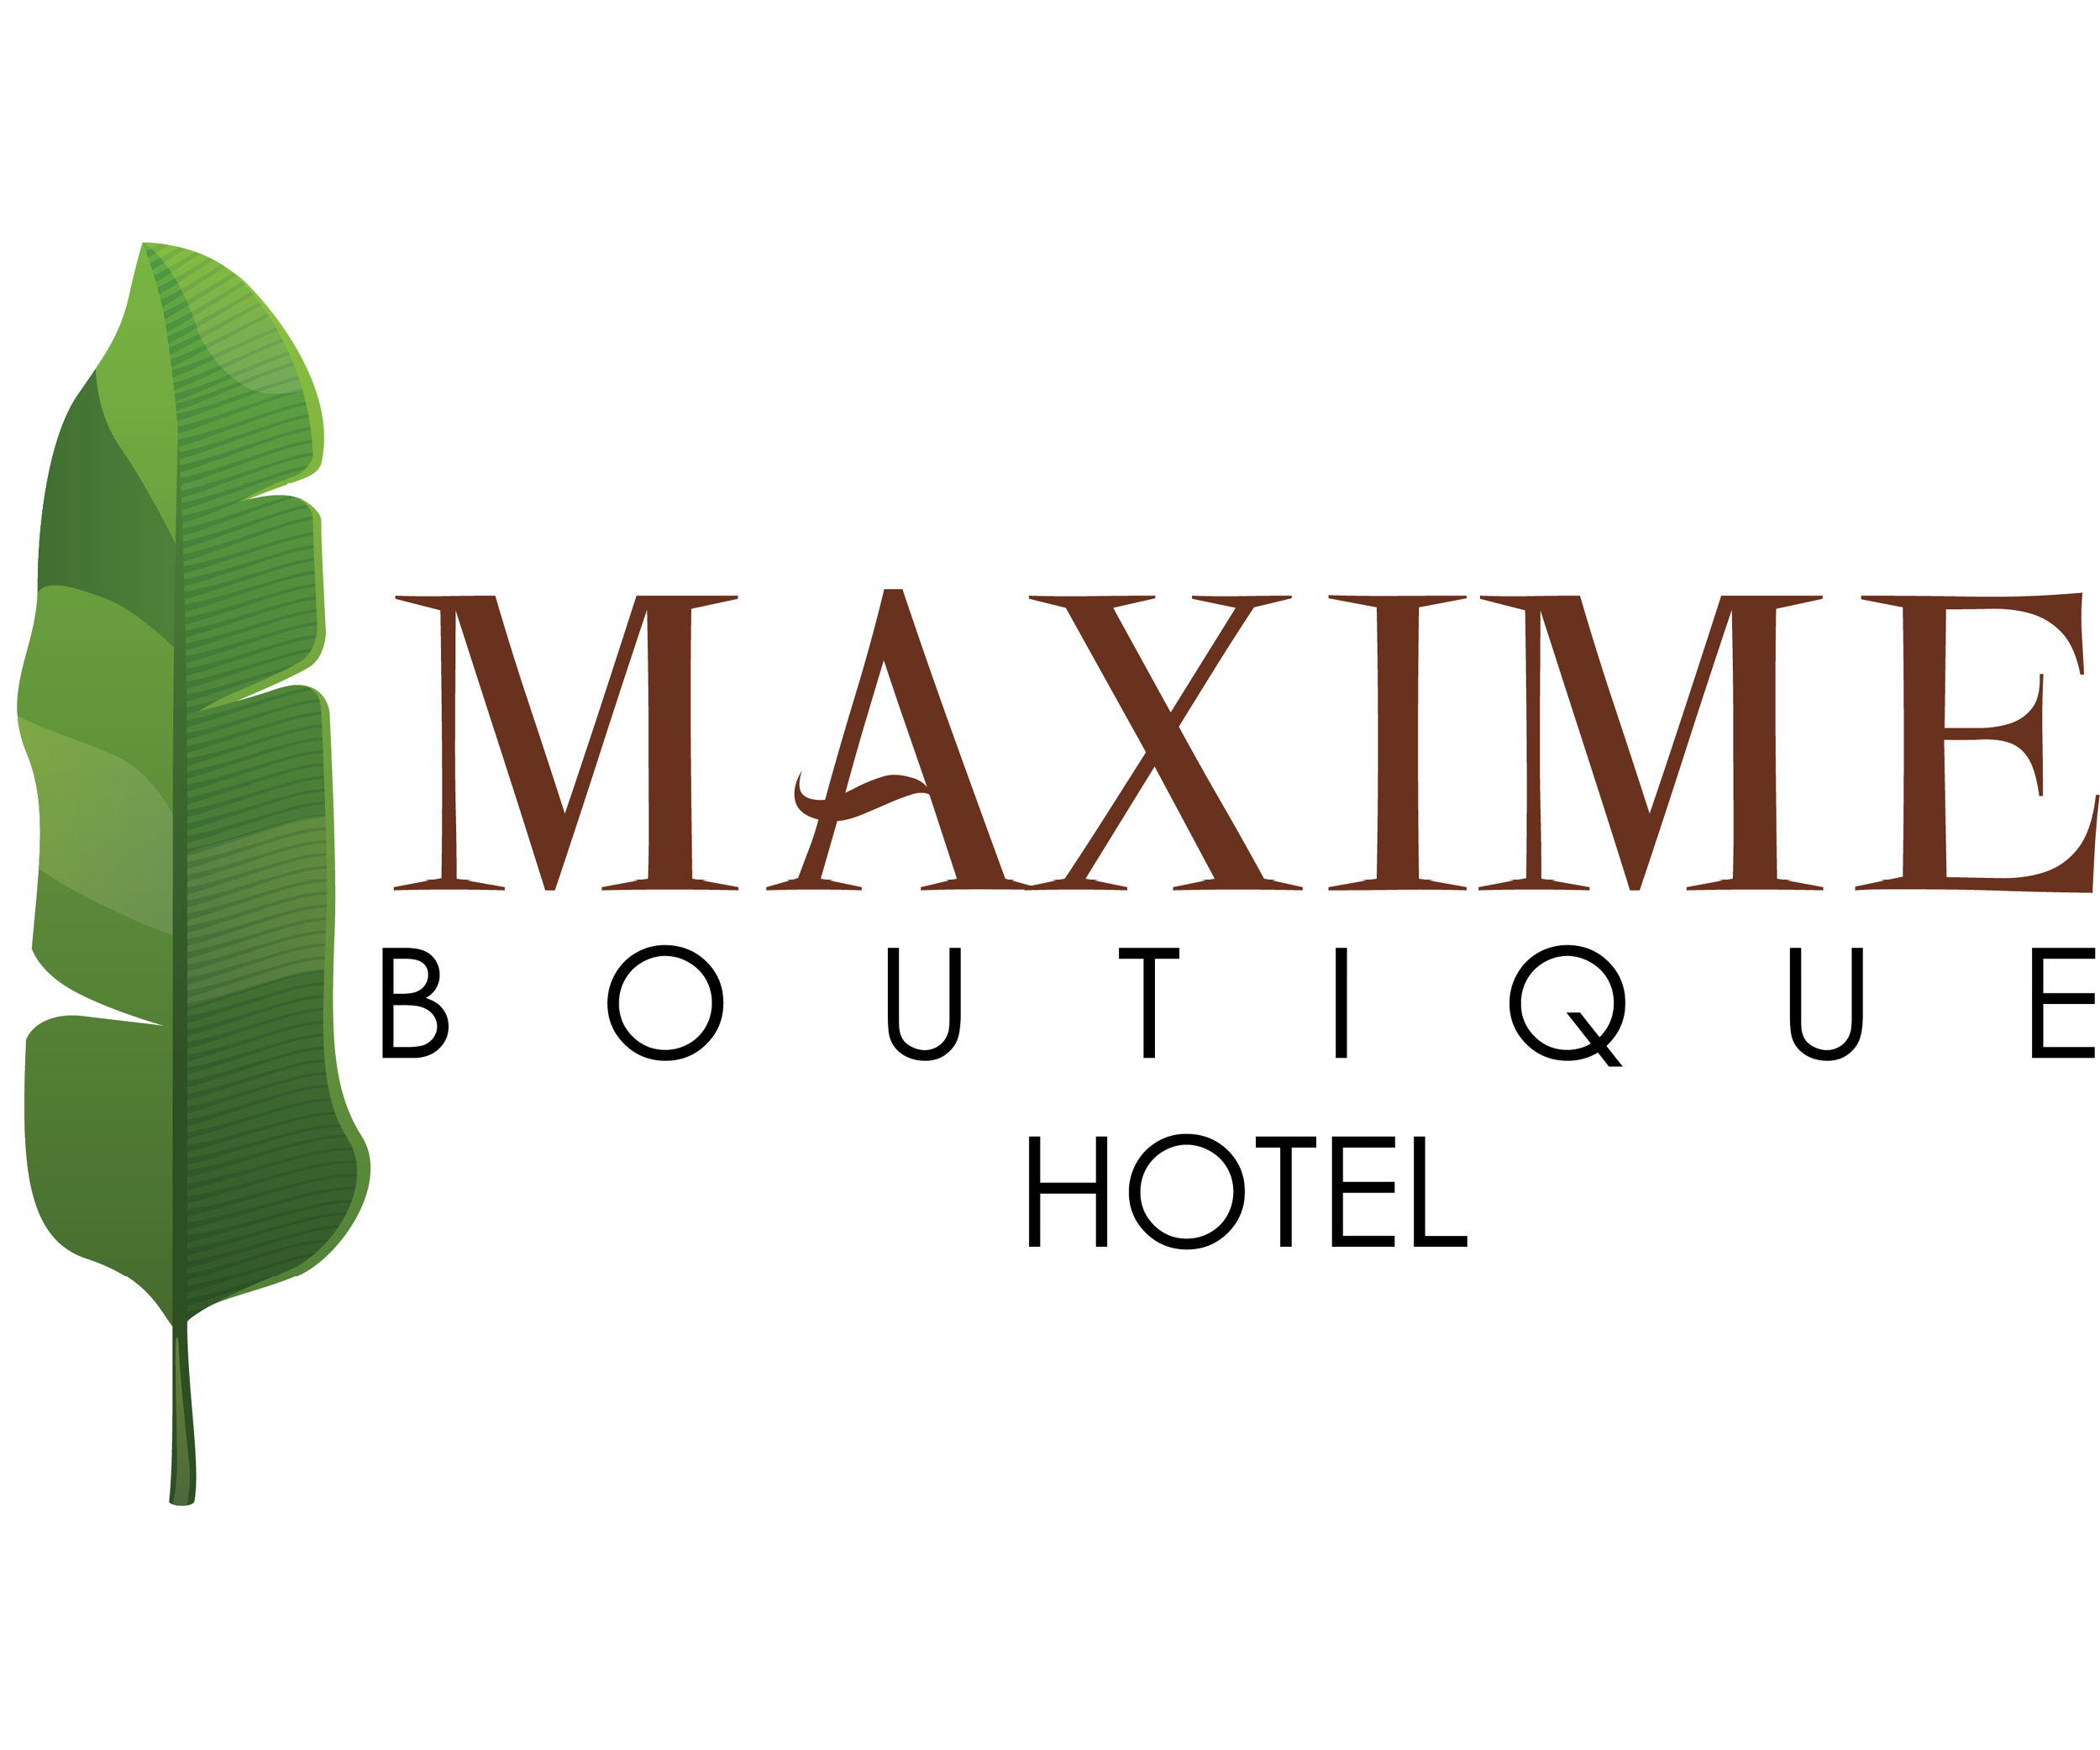 Maxime Boutique Hotel.jpg